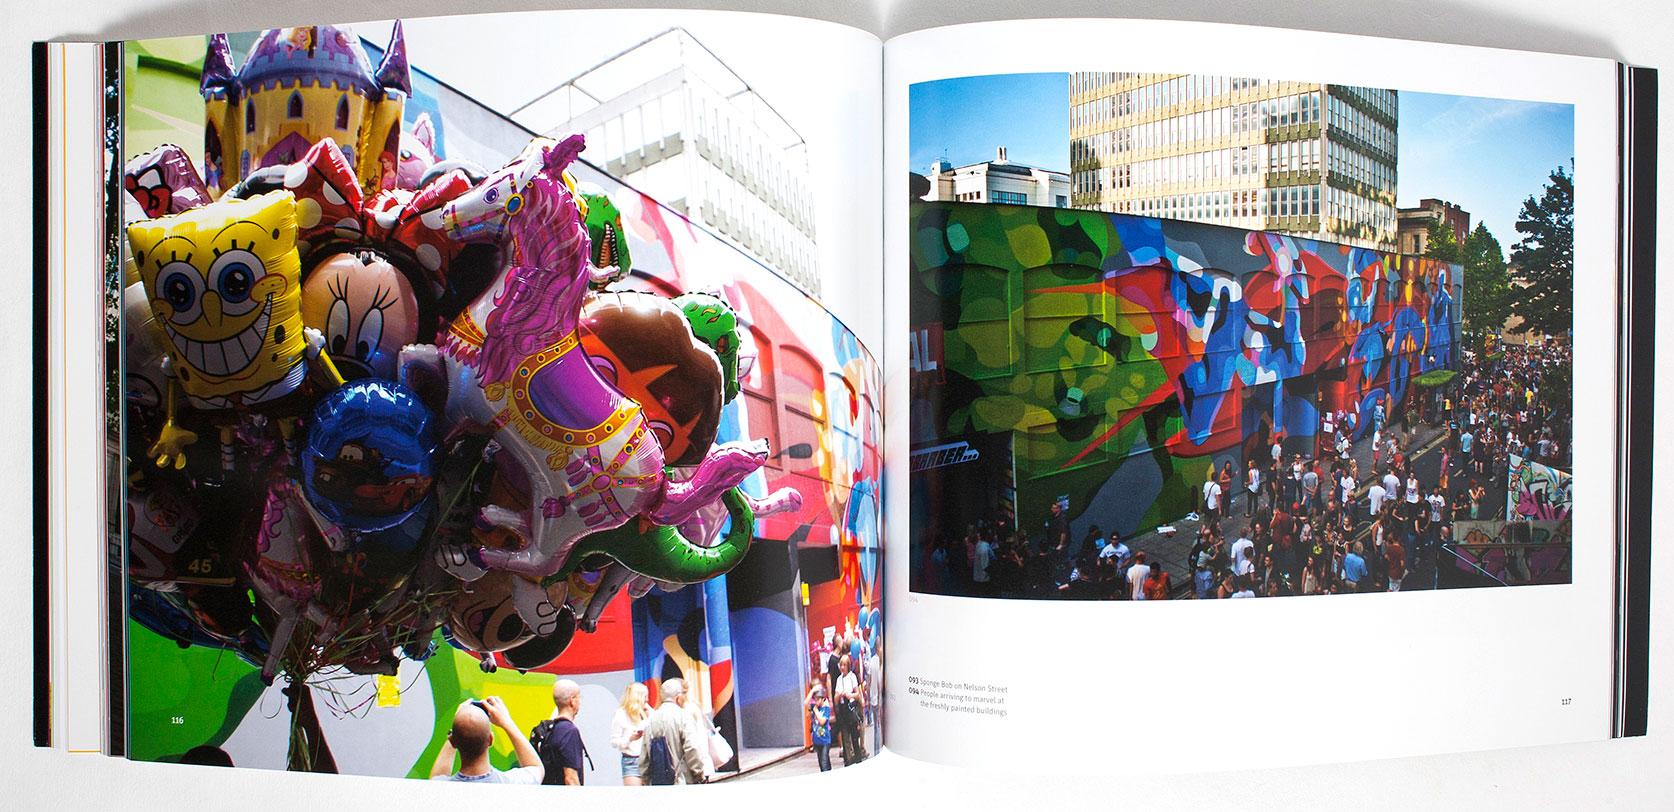 epm-print-management-bristol-art-books-see-no-evil-7.jpg